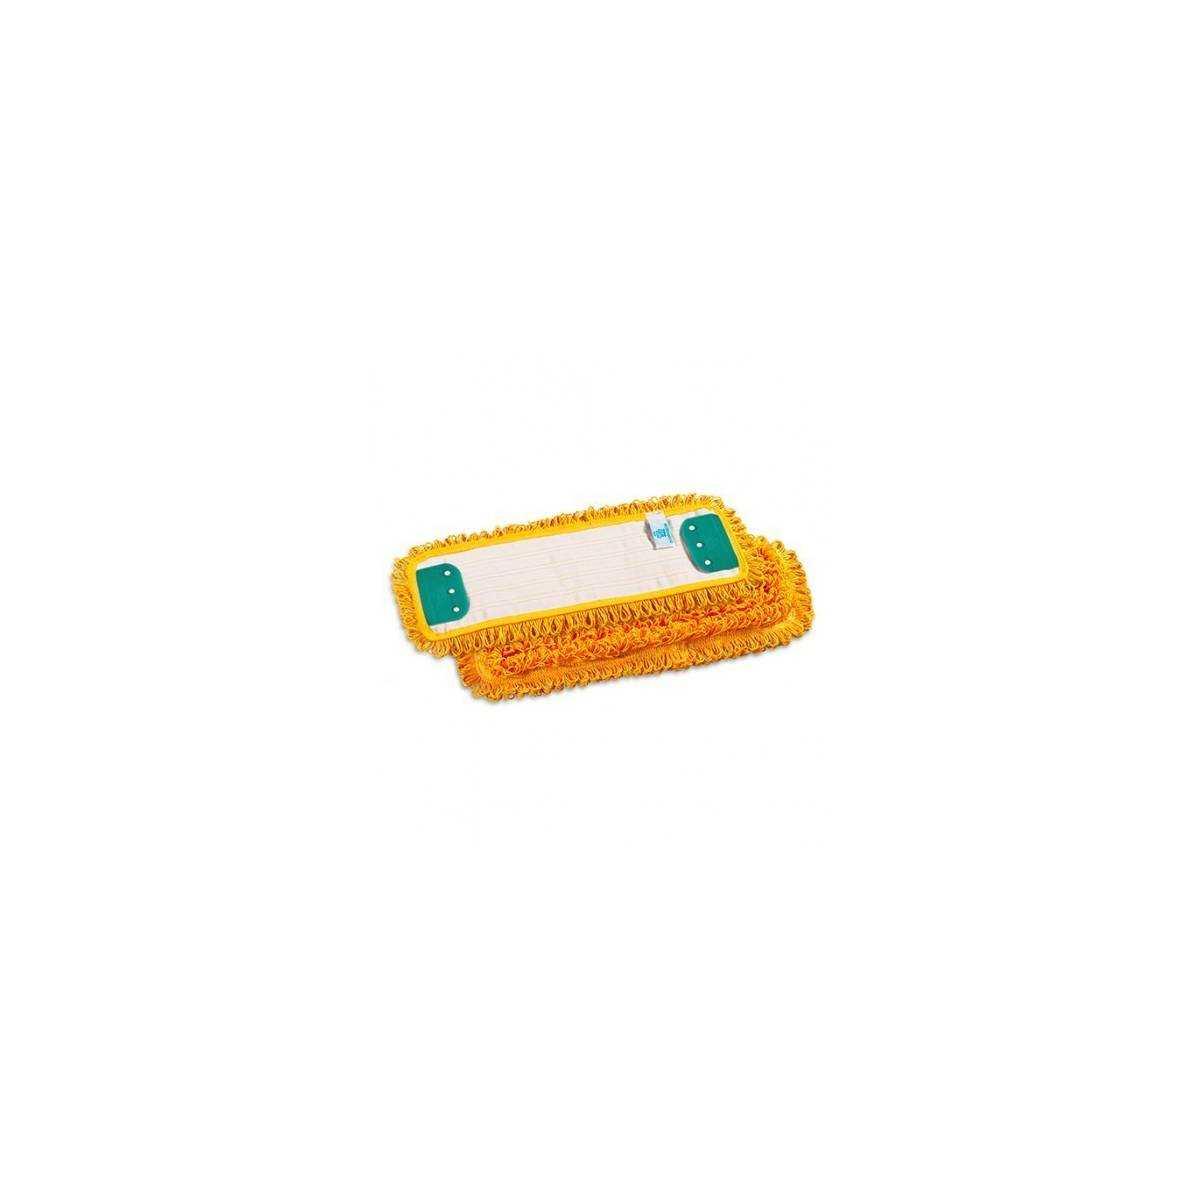 Моп Microriccio Wet System микрофибра 40см (Желтый цвет) 0G000694MG TTS